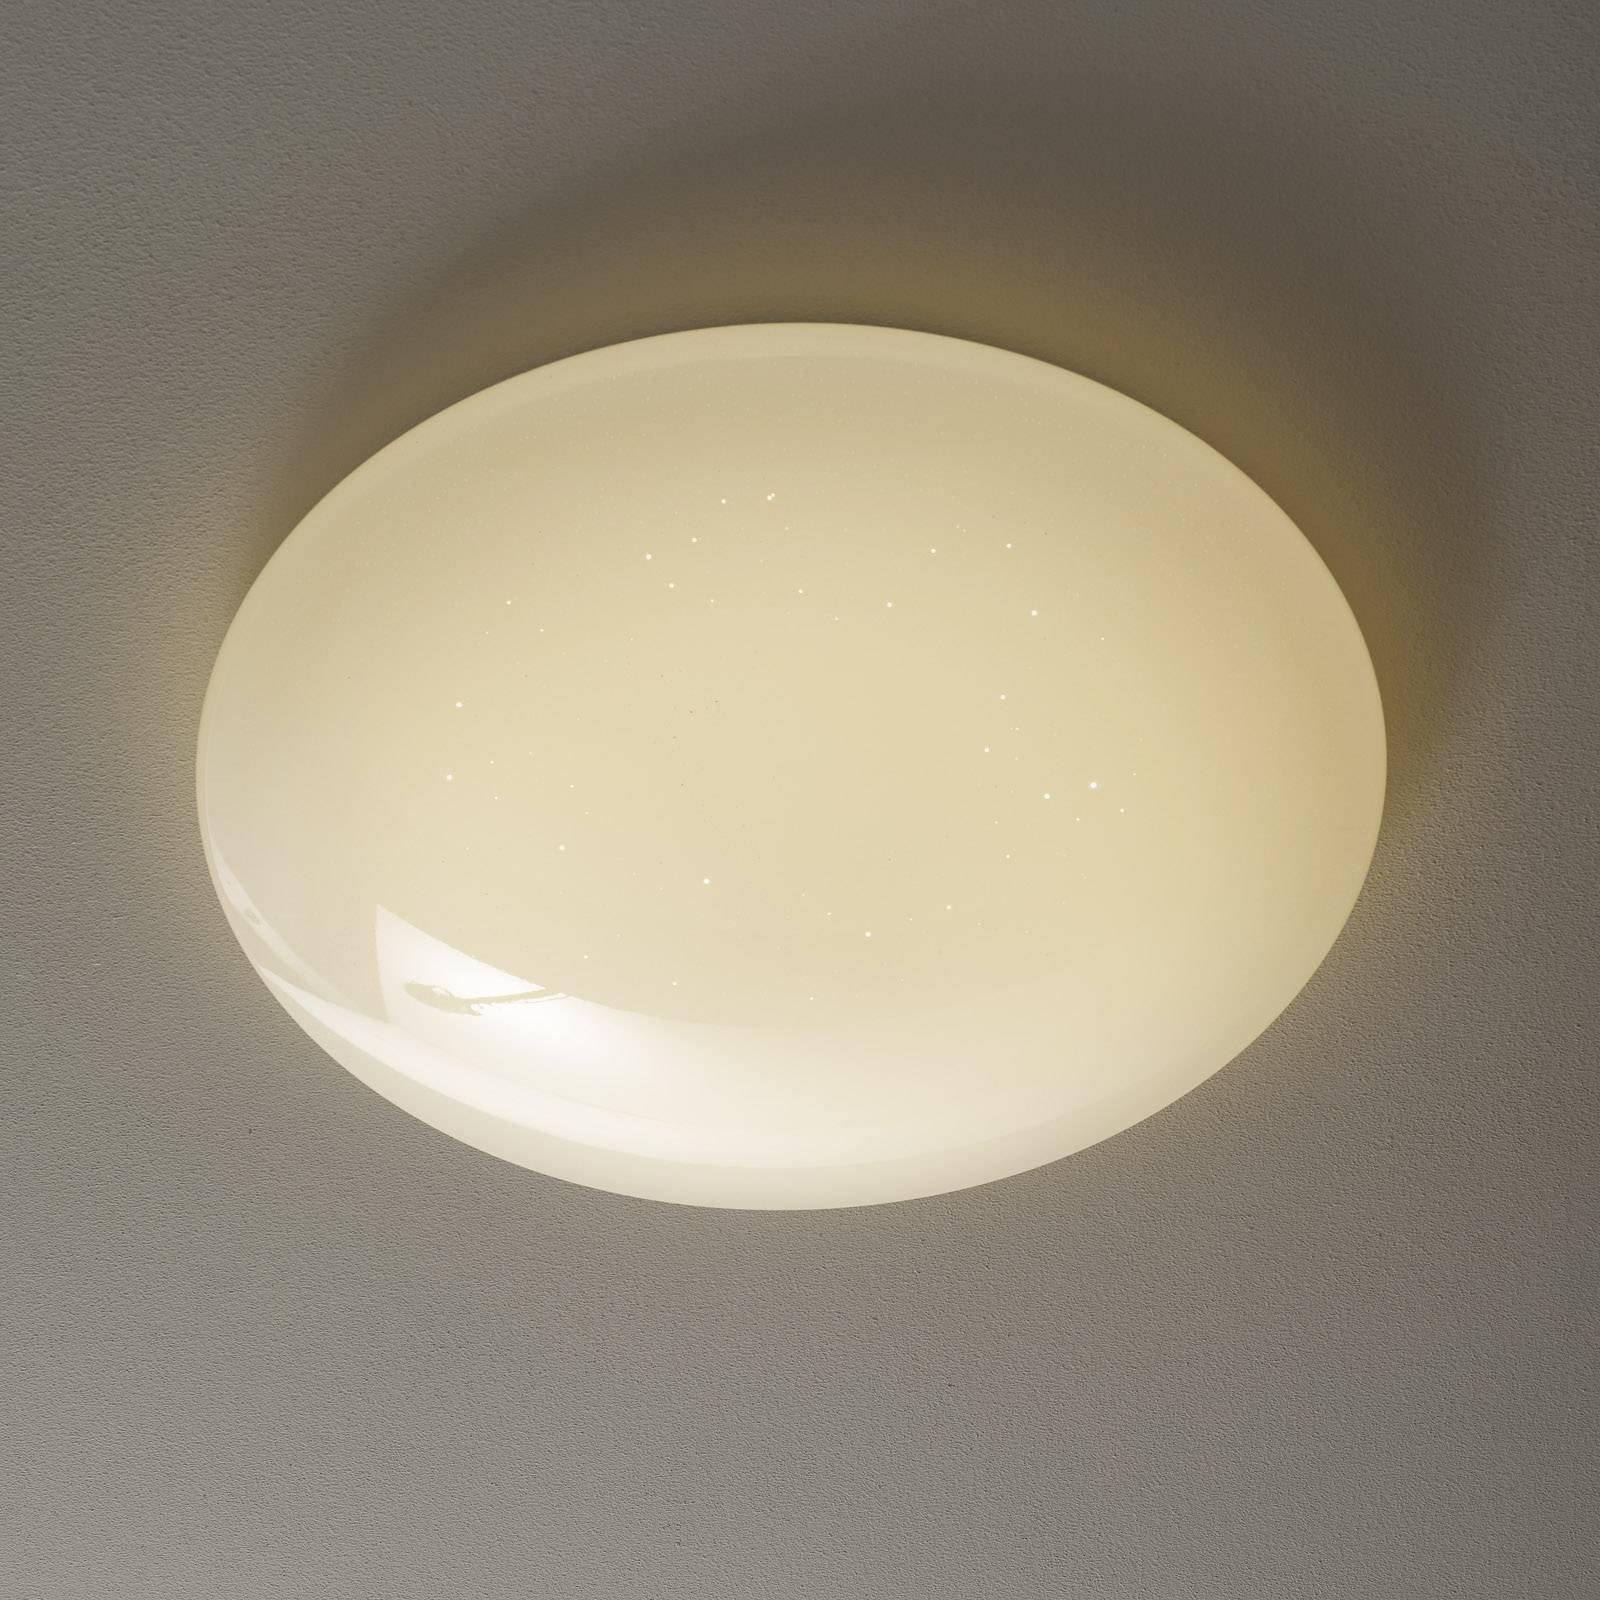 EGLO connect Totari-C LED-taklampe krystall RGB